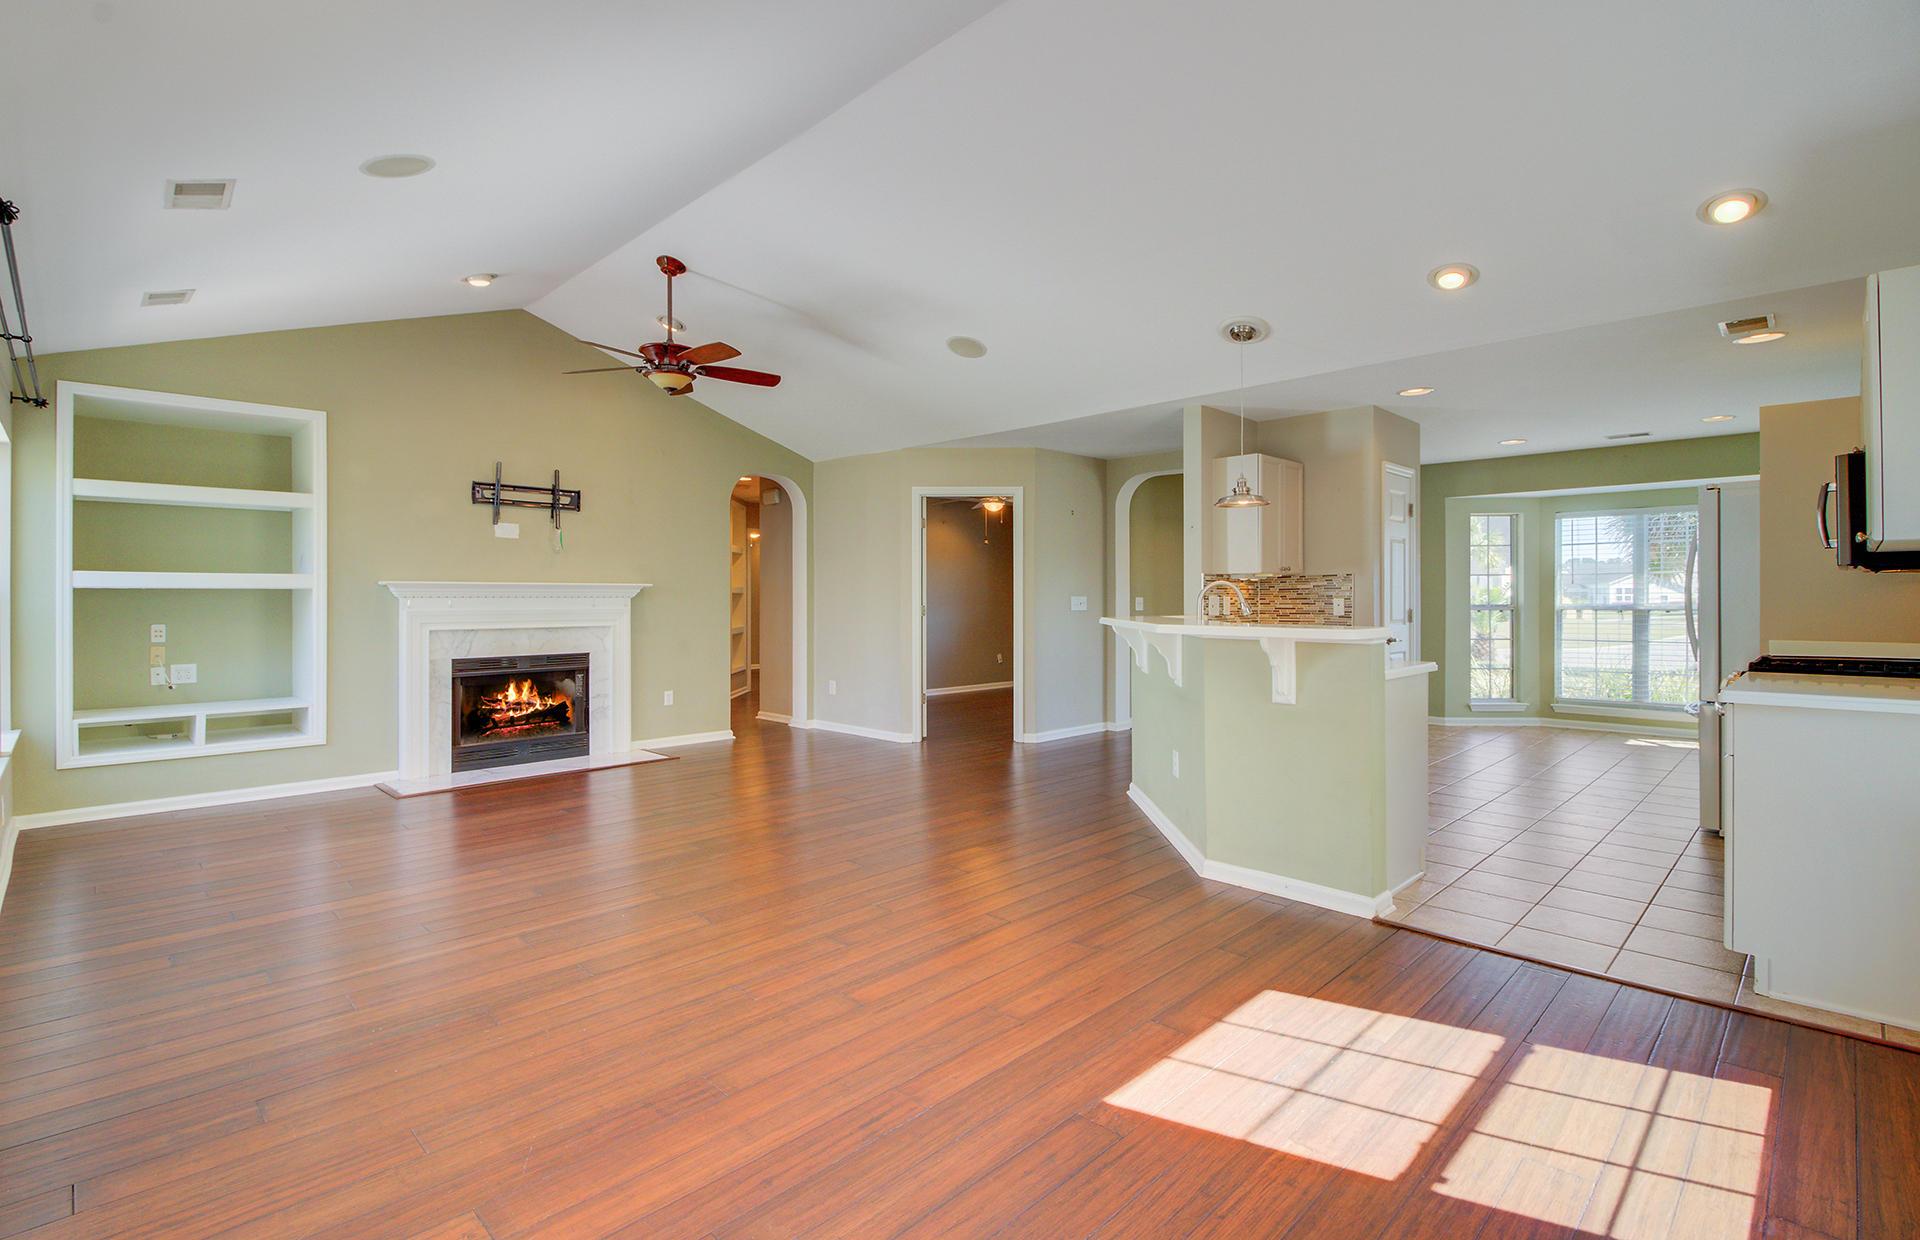 Grand Oaks Plantation Homes For Sale - 789 Bent Hickory, Charleston, SC - 9